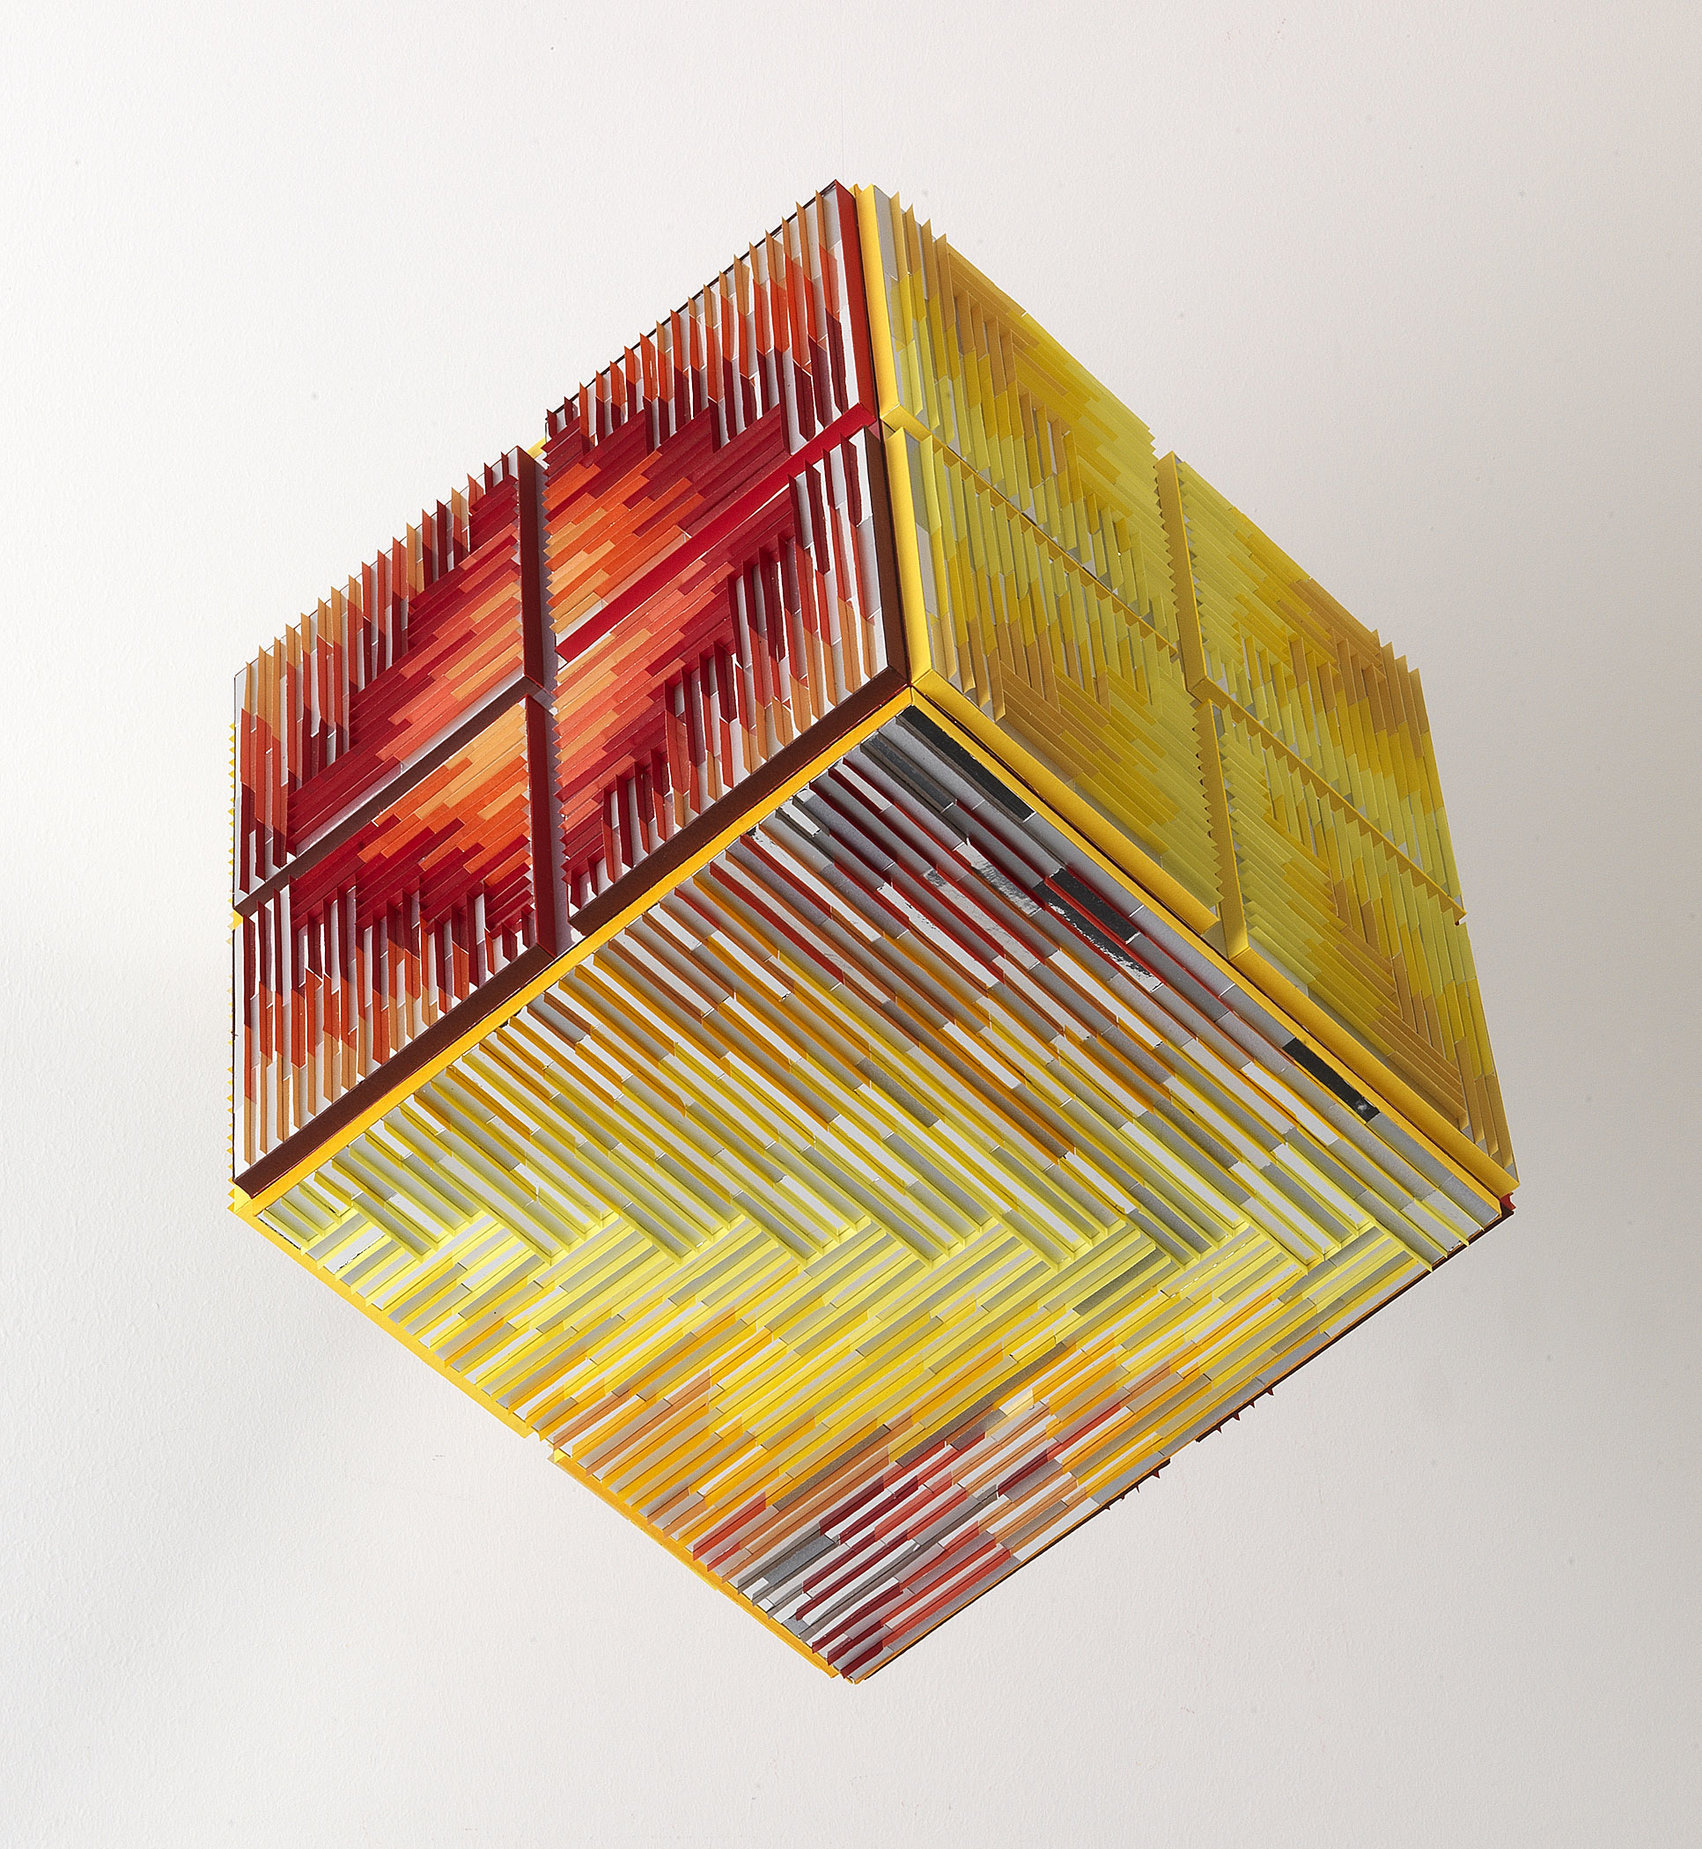 Francoise-LUCIANI-Cube-sorti.2-.jpg